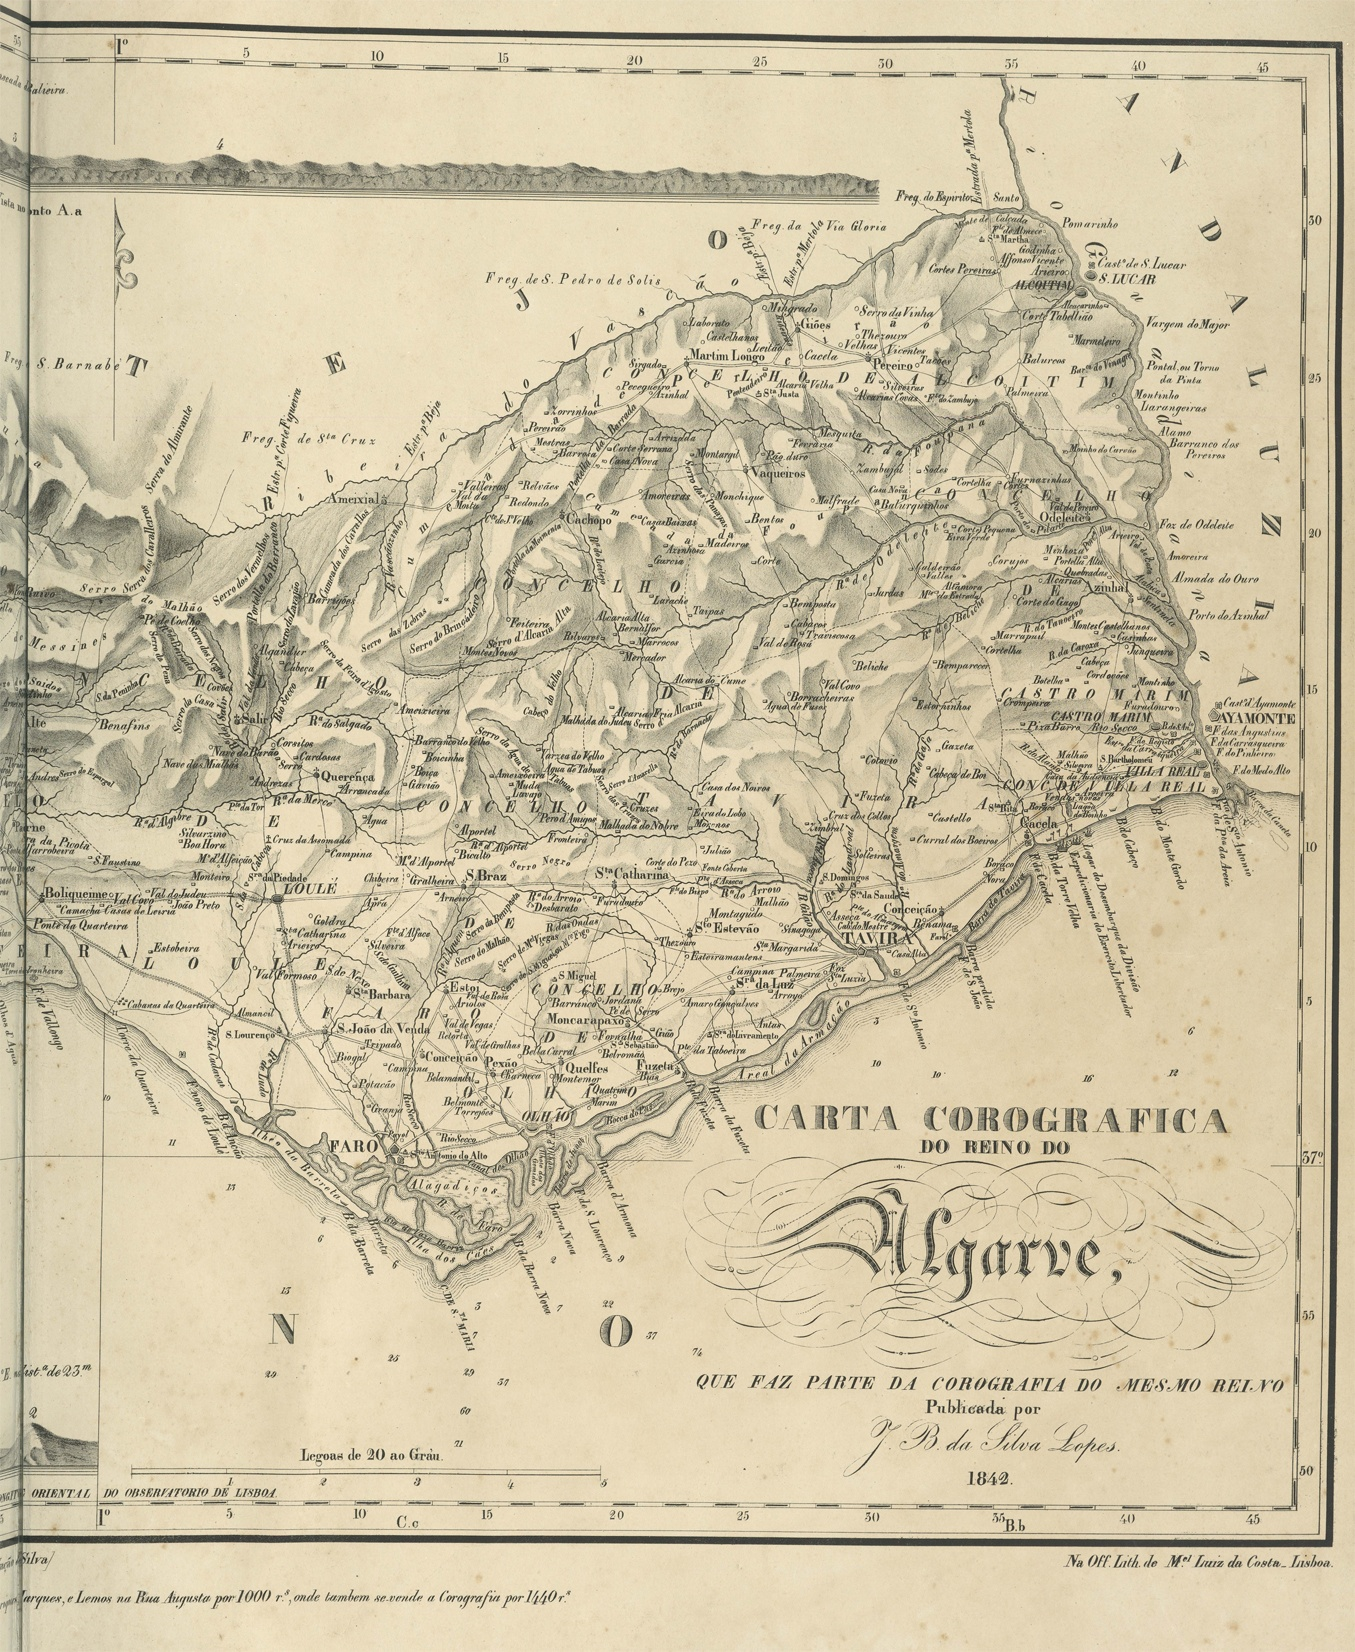 rcg_horst_fig.6_carta_corografica_do_reino_do_algarve_lisbon_1842_nachl._f._kunstmann_c.7